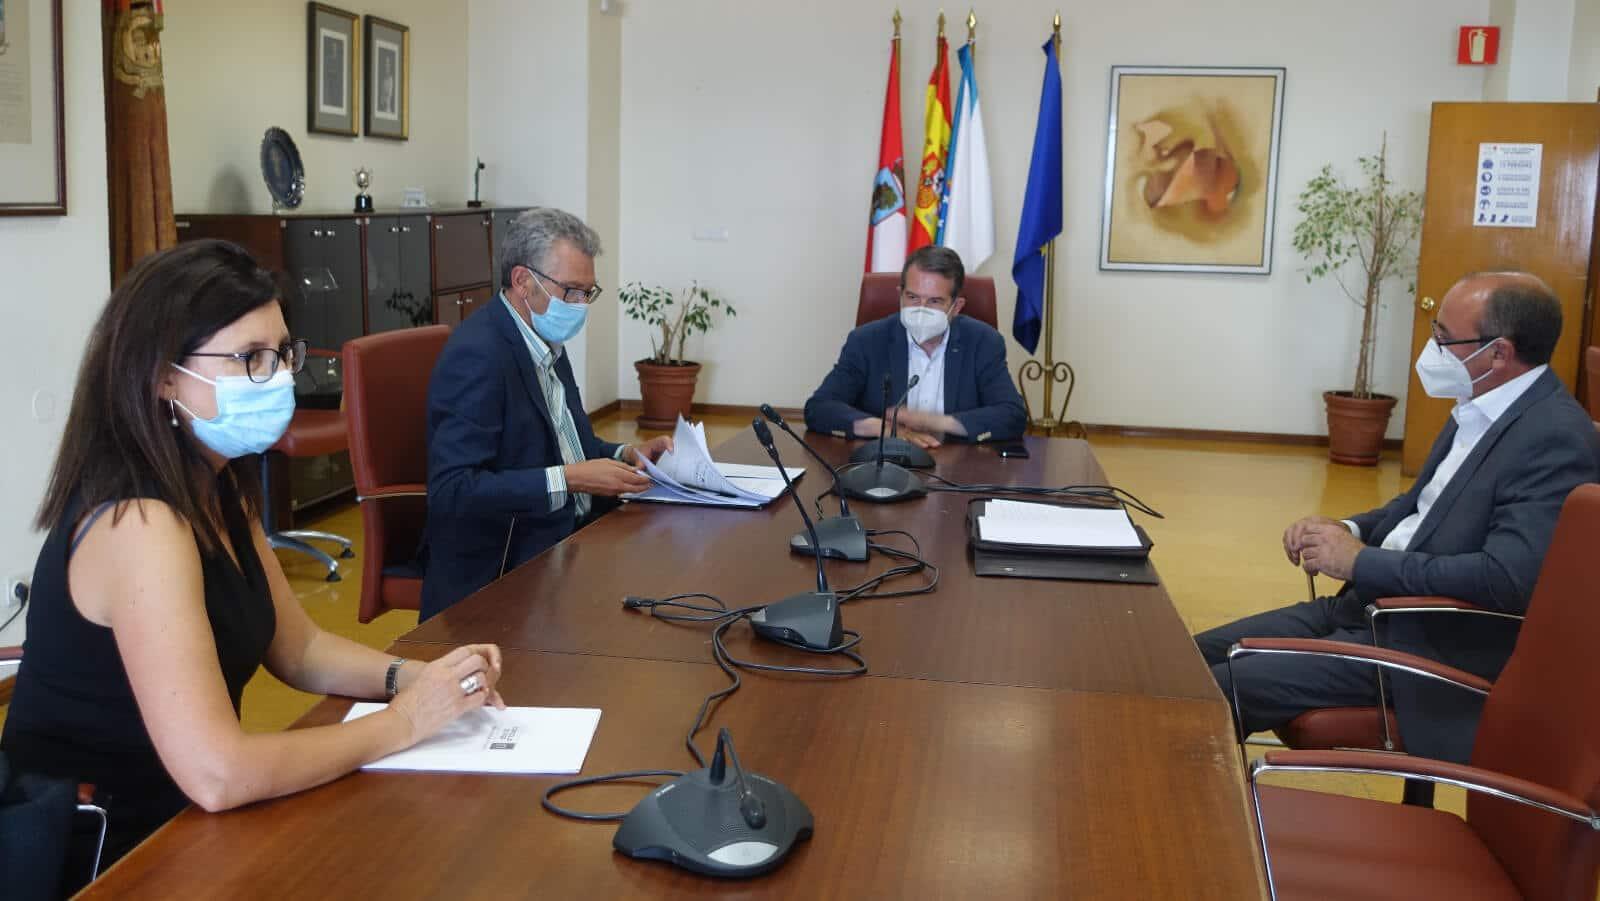 Alcalde de Vigo explica nuevo túnel Beiramar a Comisión de Logística de la CEP